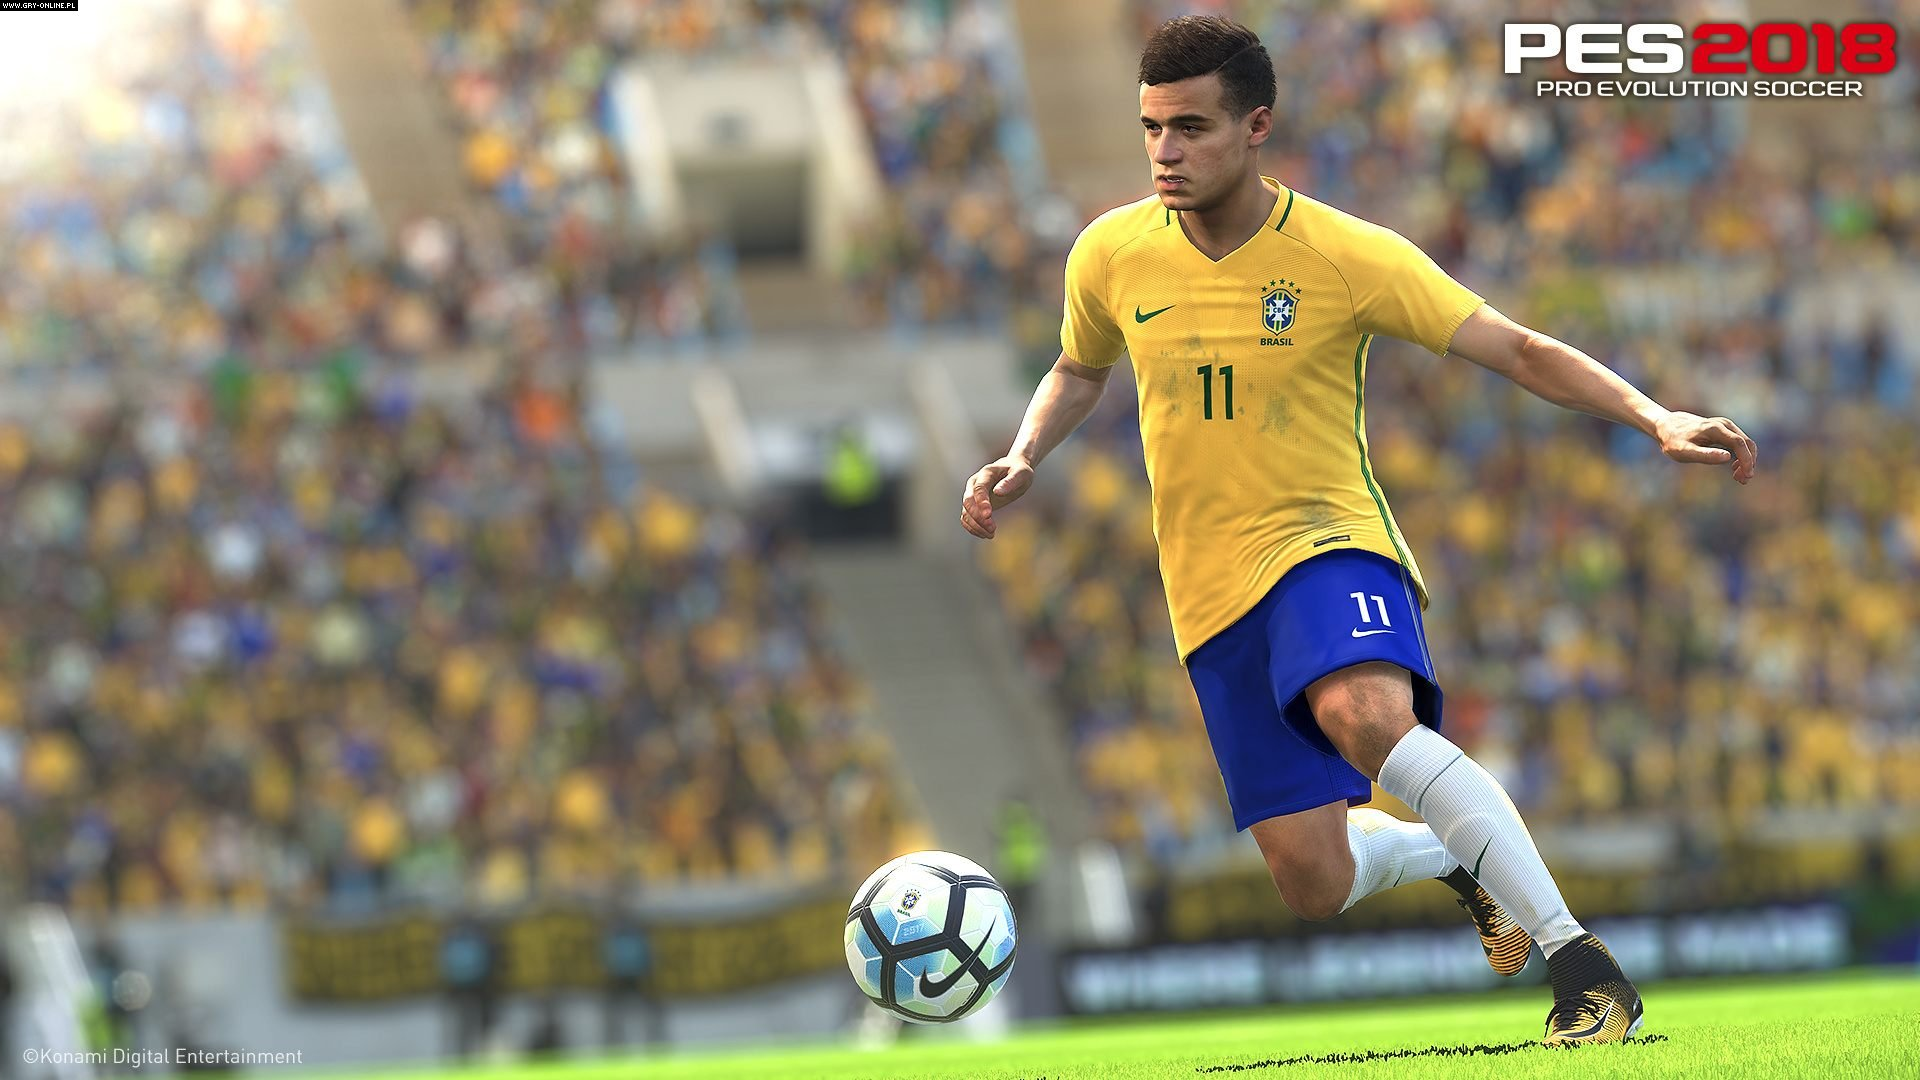 Скриншот PES 2018 / Pro Evolution Soccer 2018: FC Barcelona Edition (2017) PC